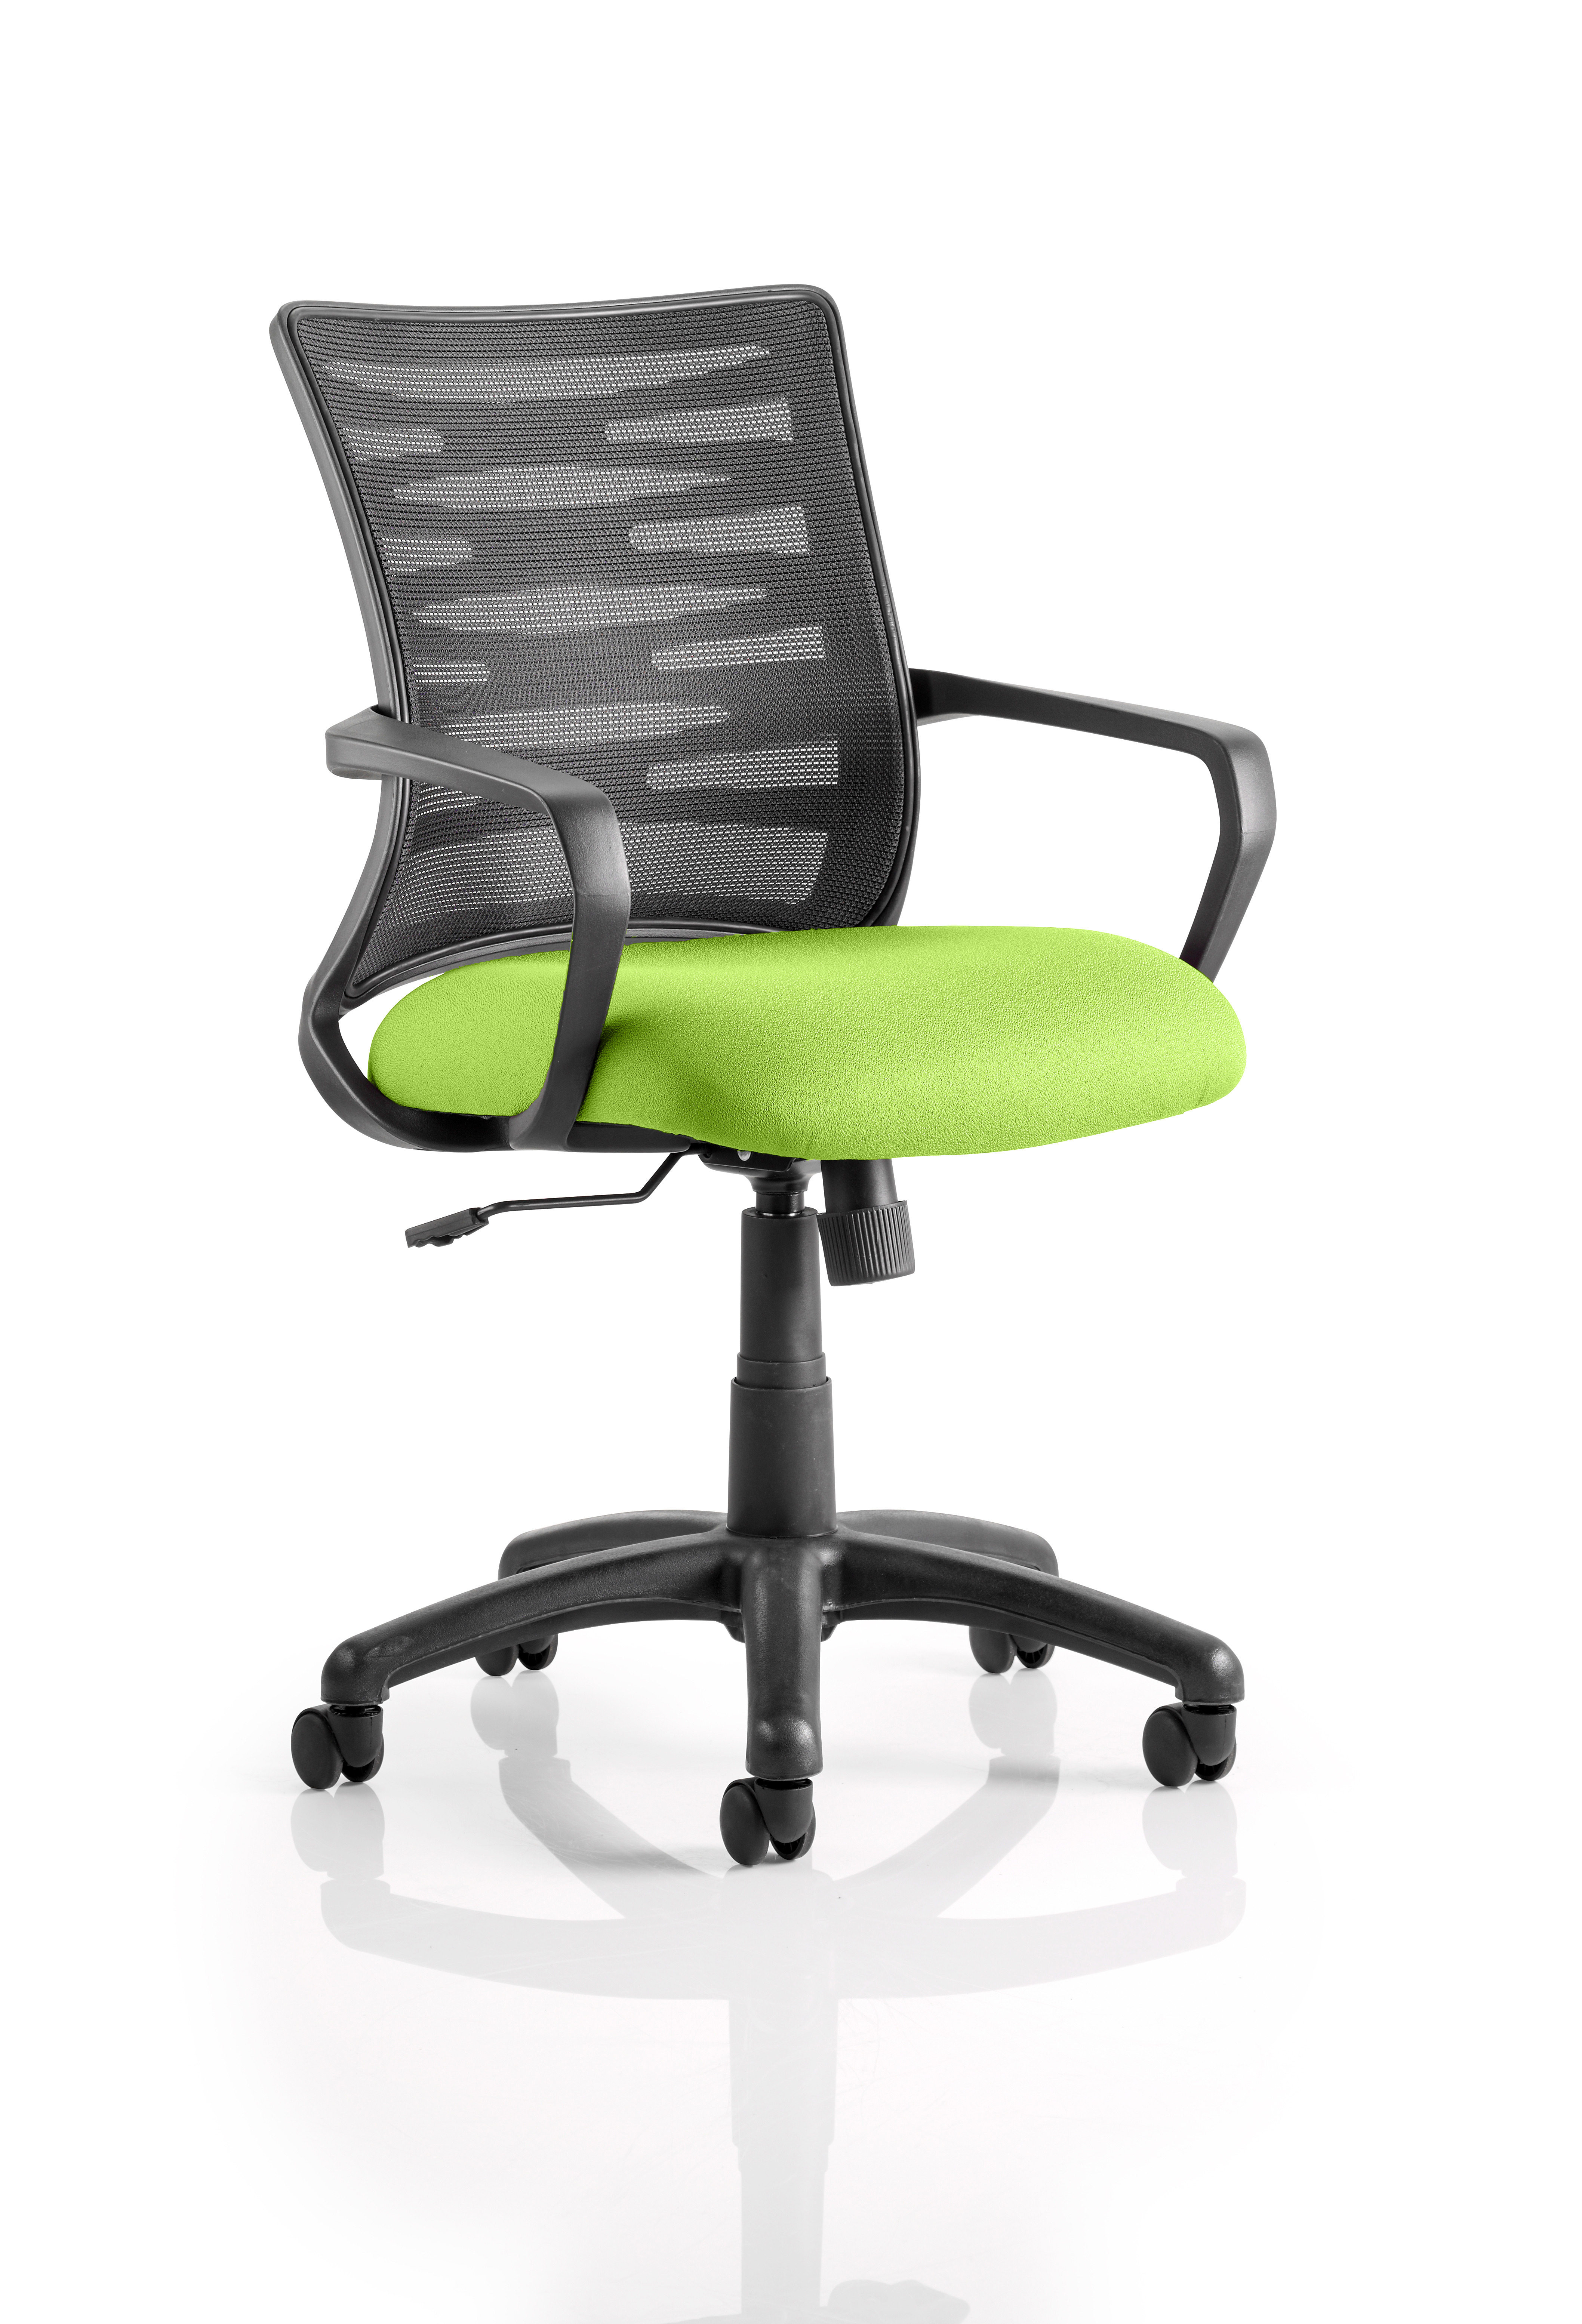 Vortex Task Operator Chair Mesh Back Bespoke Seat Myrrh Green KCUP0602